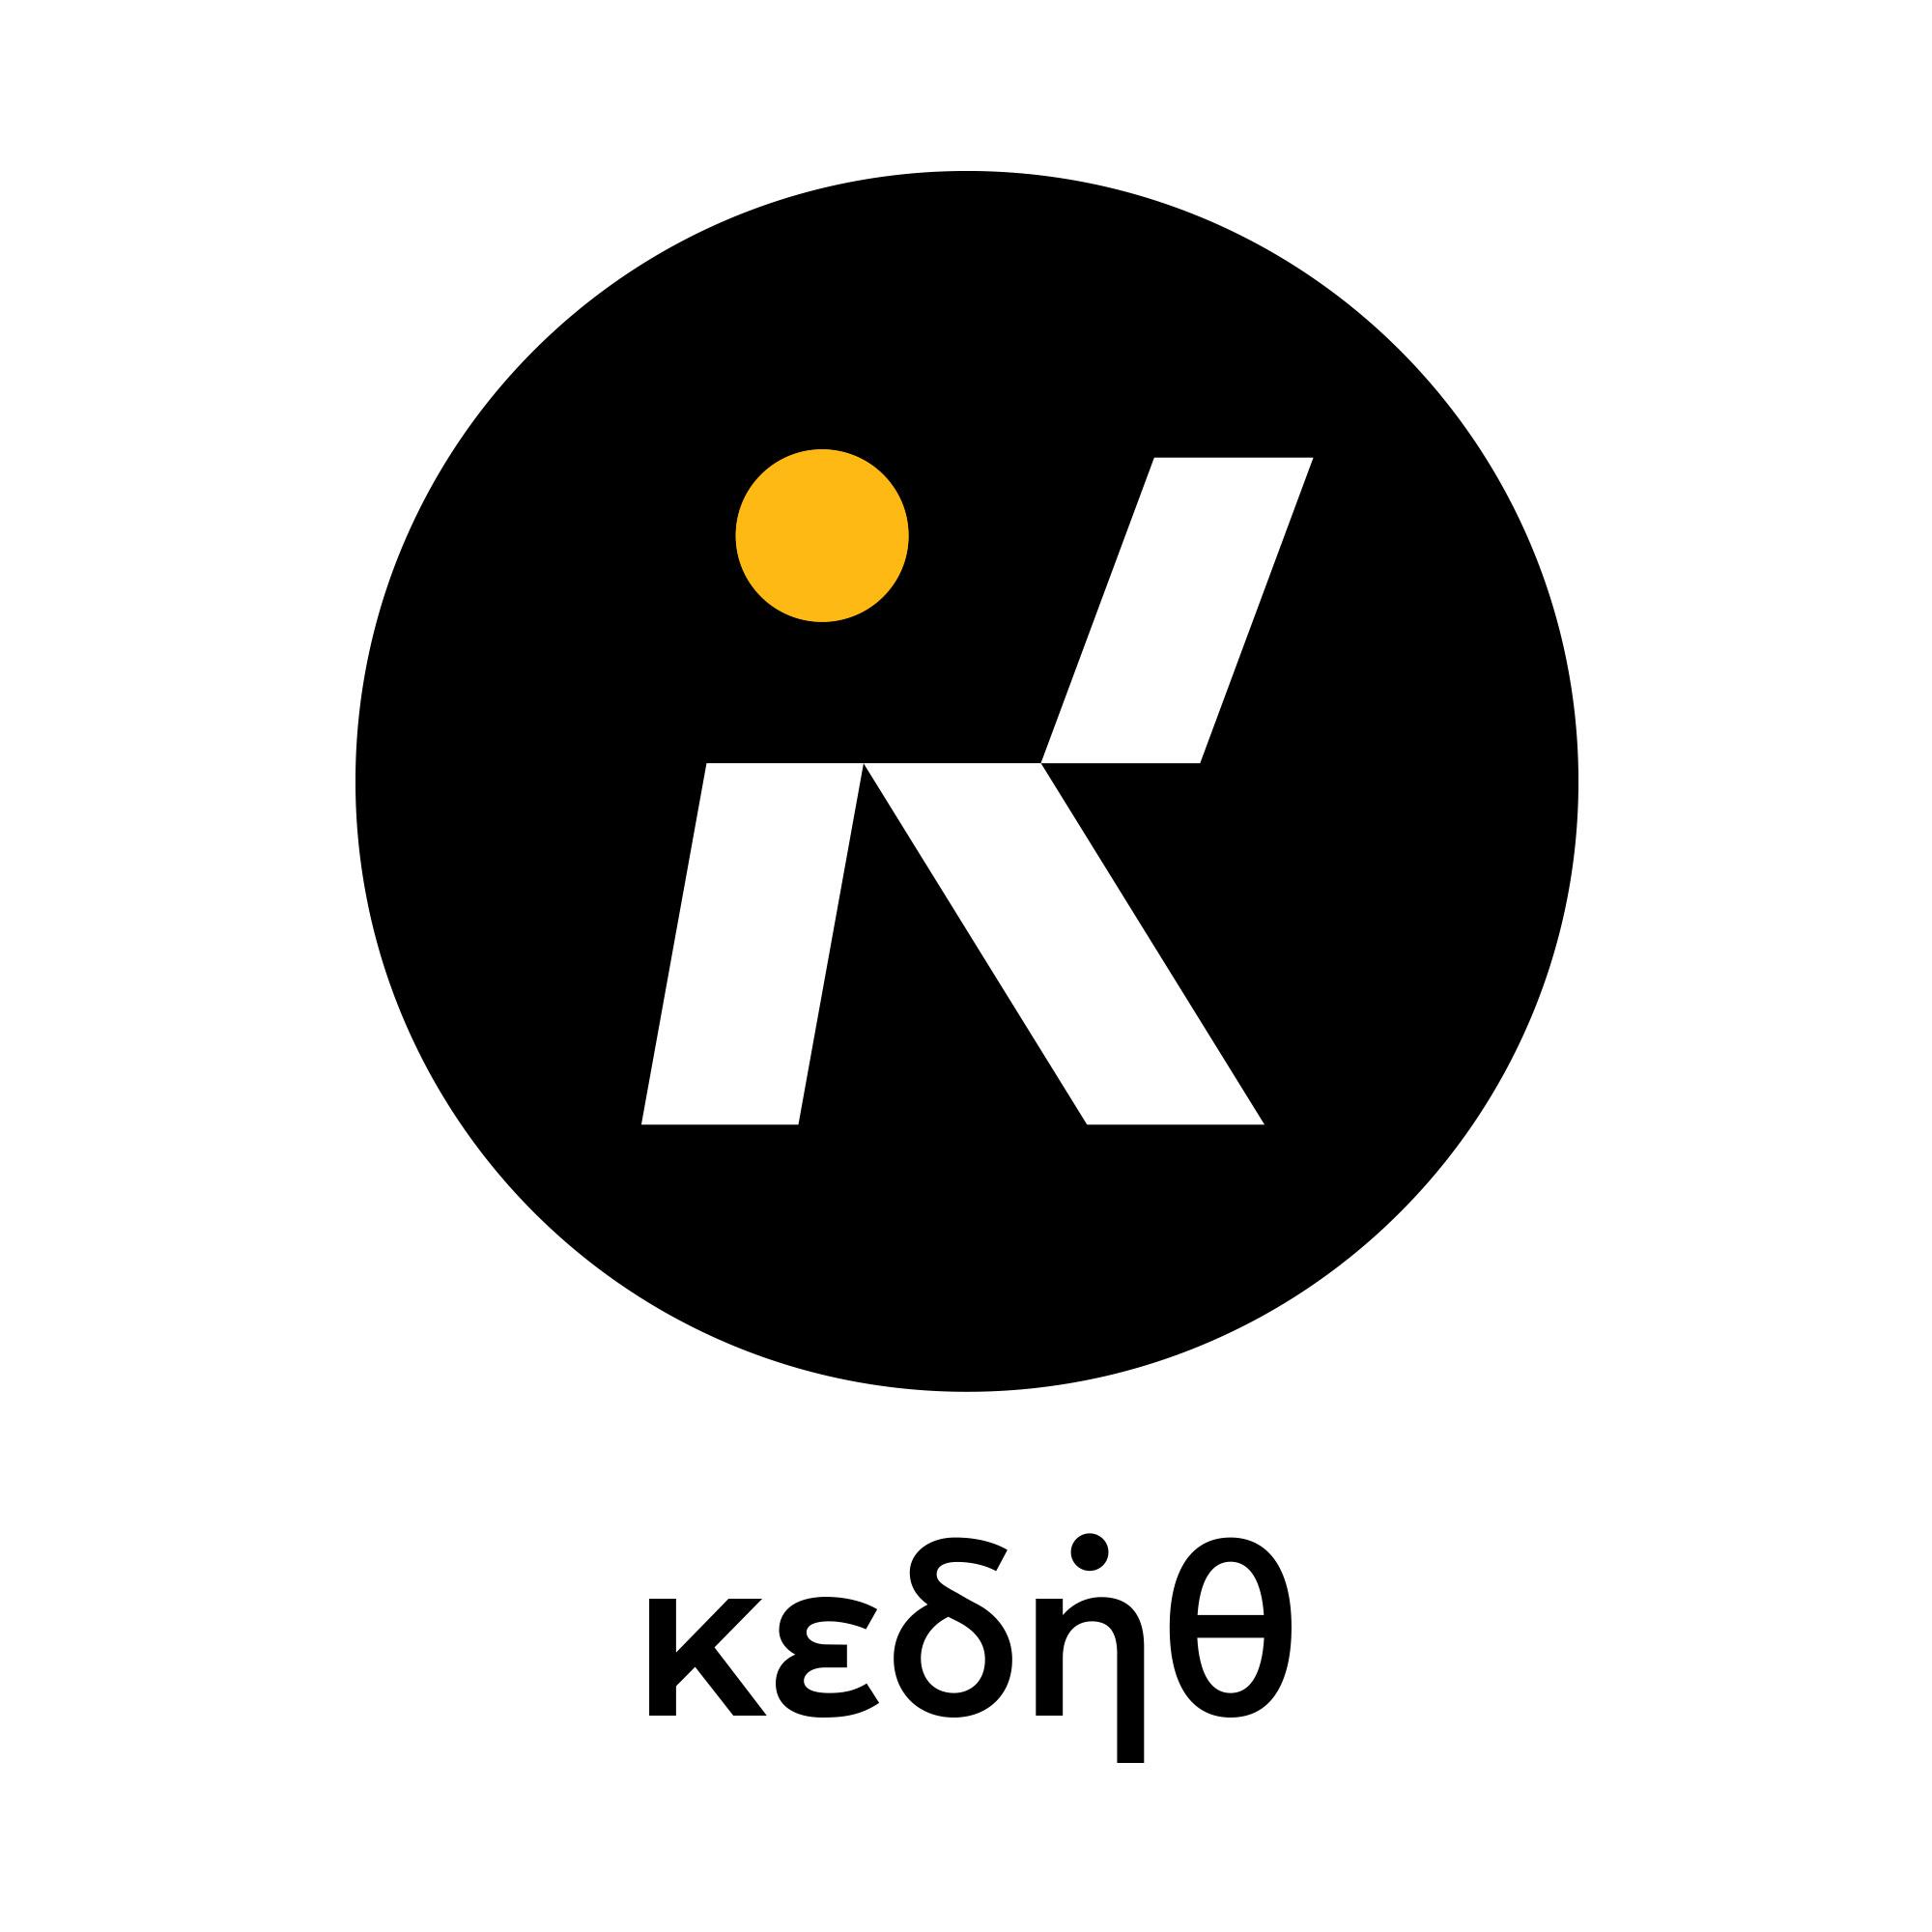 KEDITH_NAME_OUT.jpg